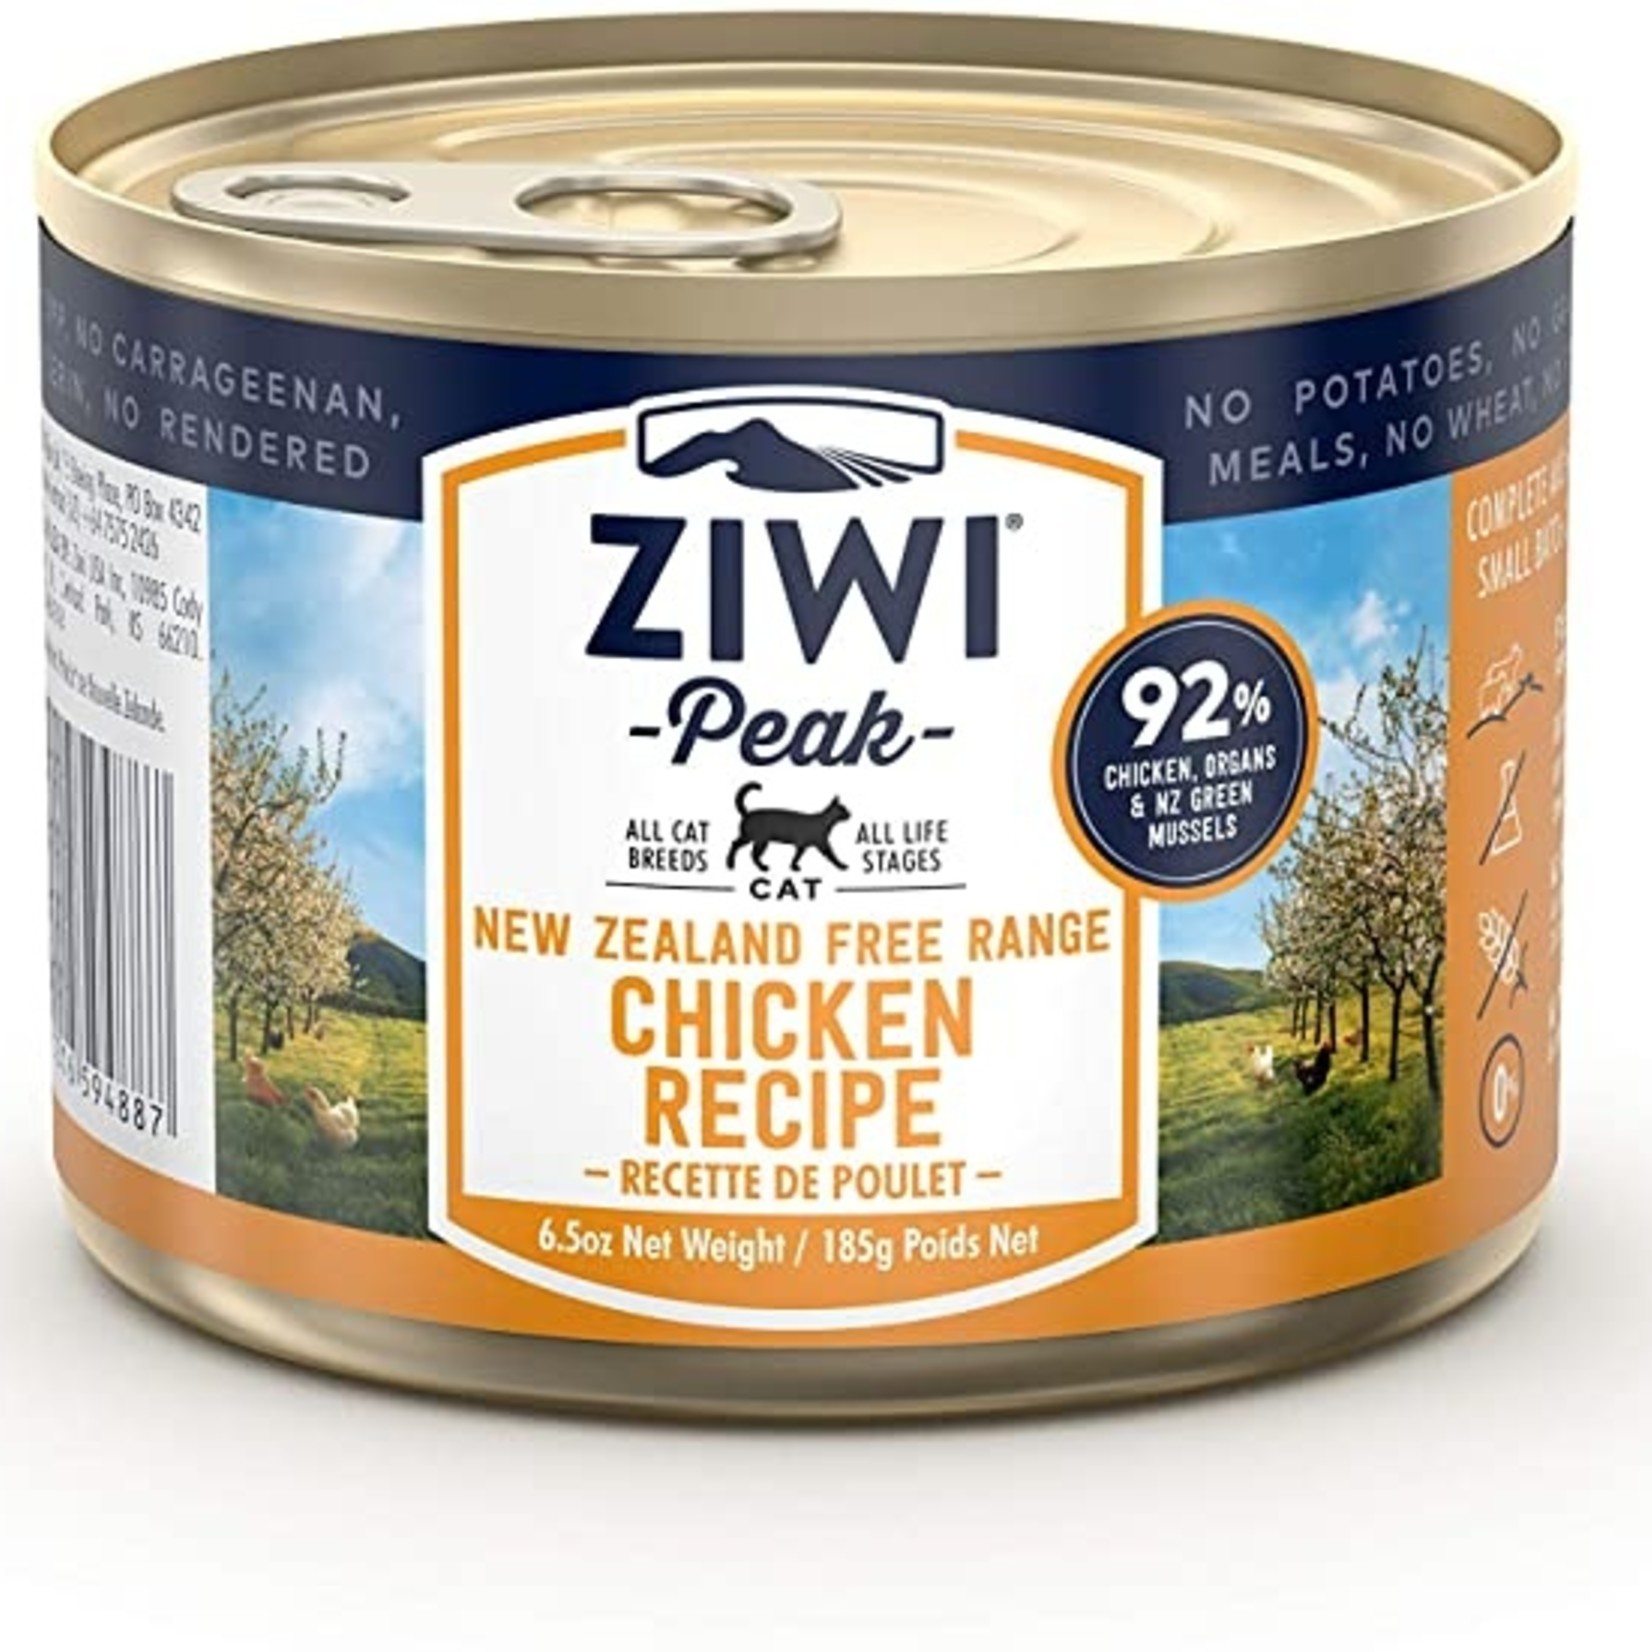 Ziwi Peak Ziwi Peak Cat Grain Free Chicken 6.5 OZ